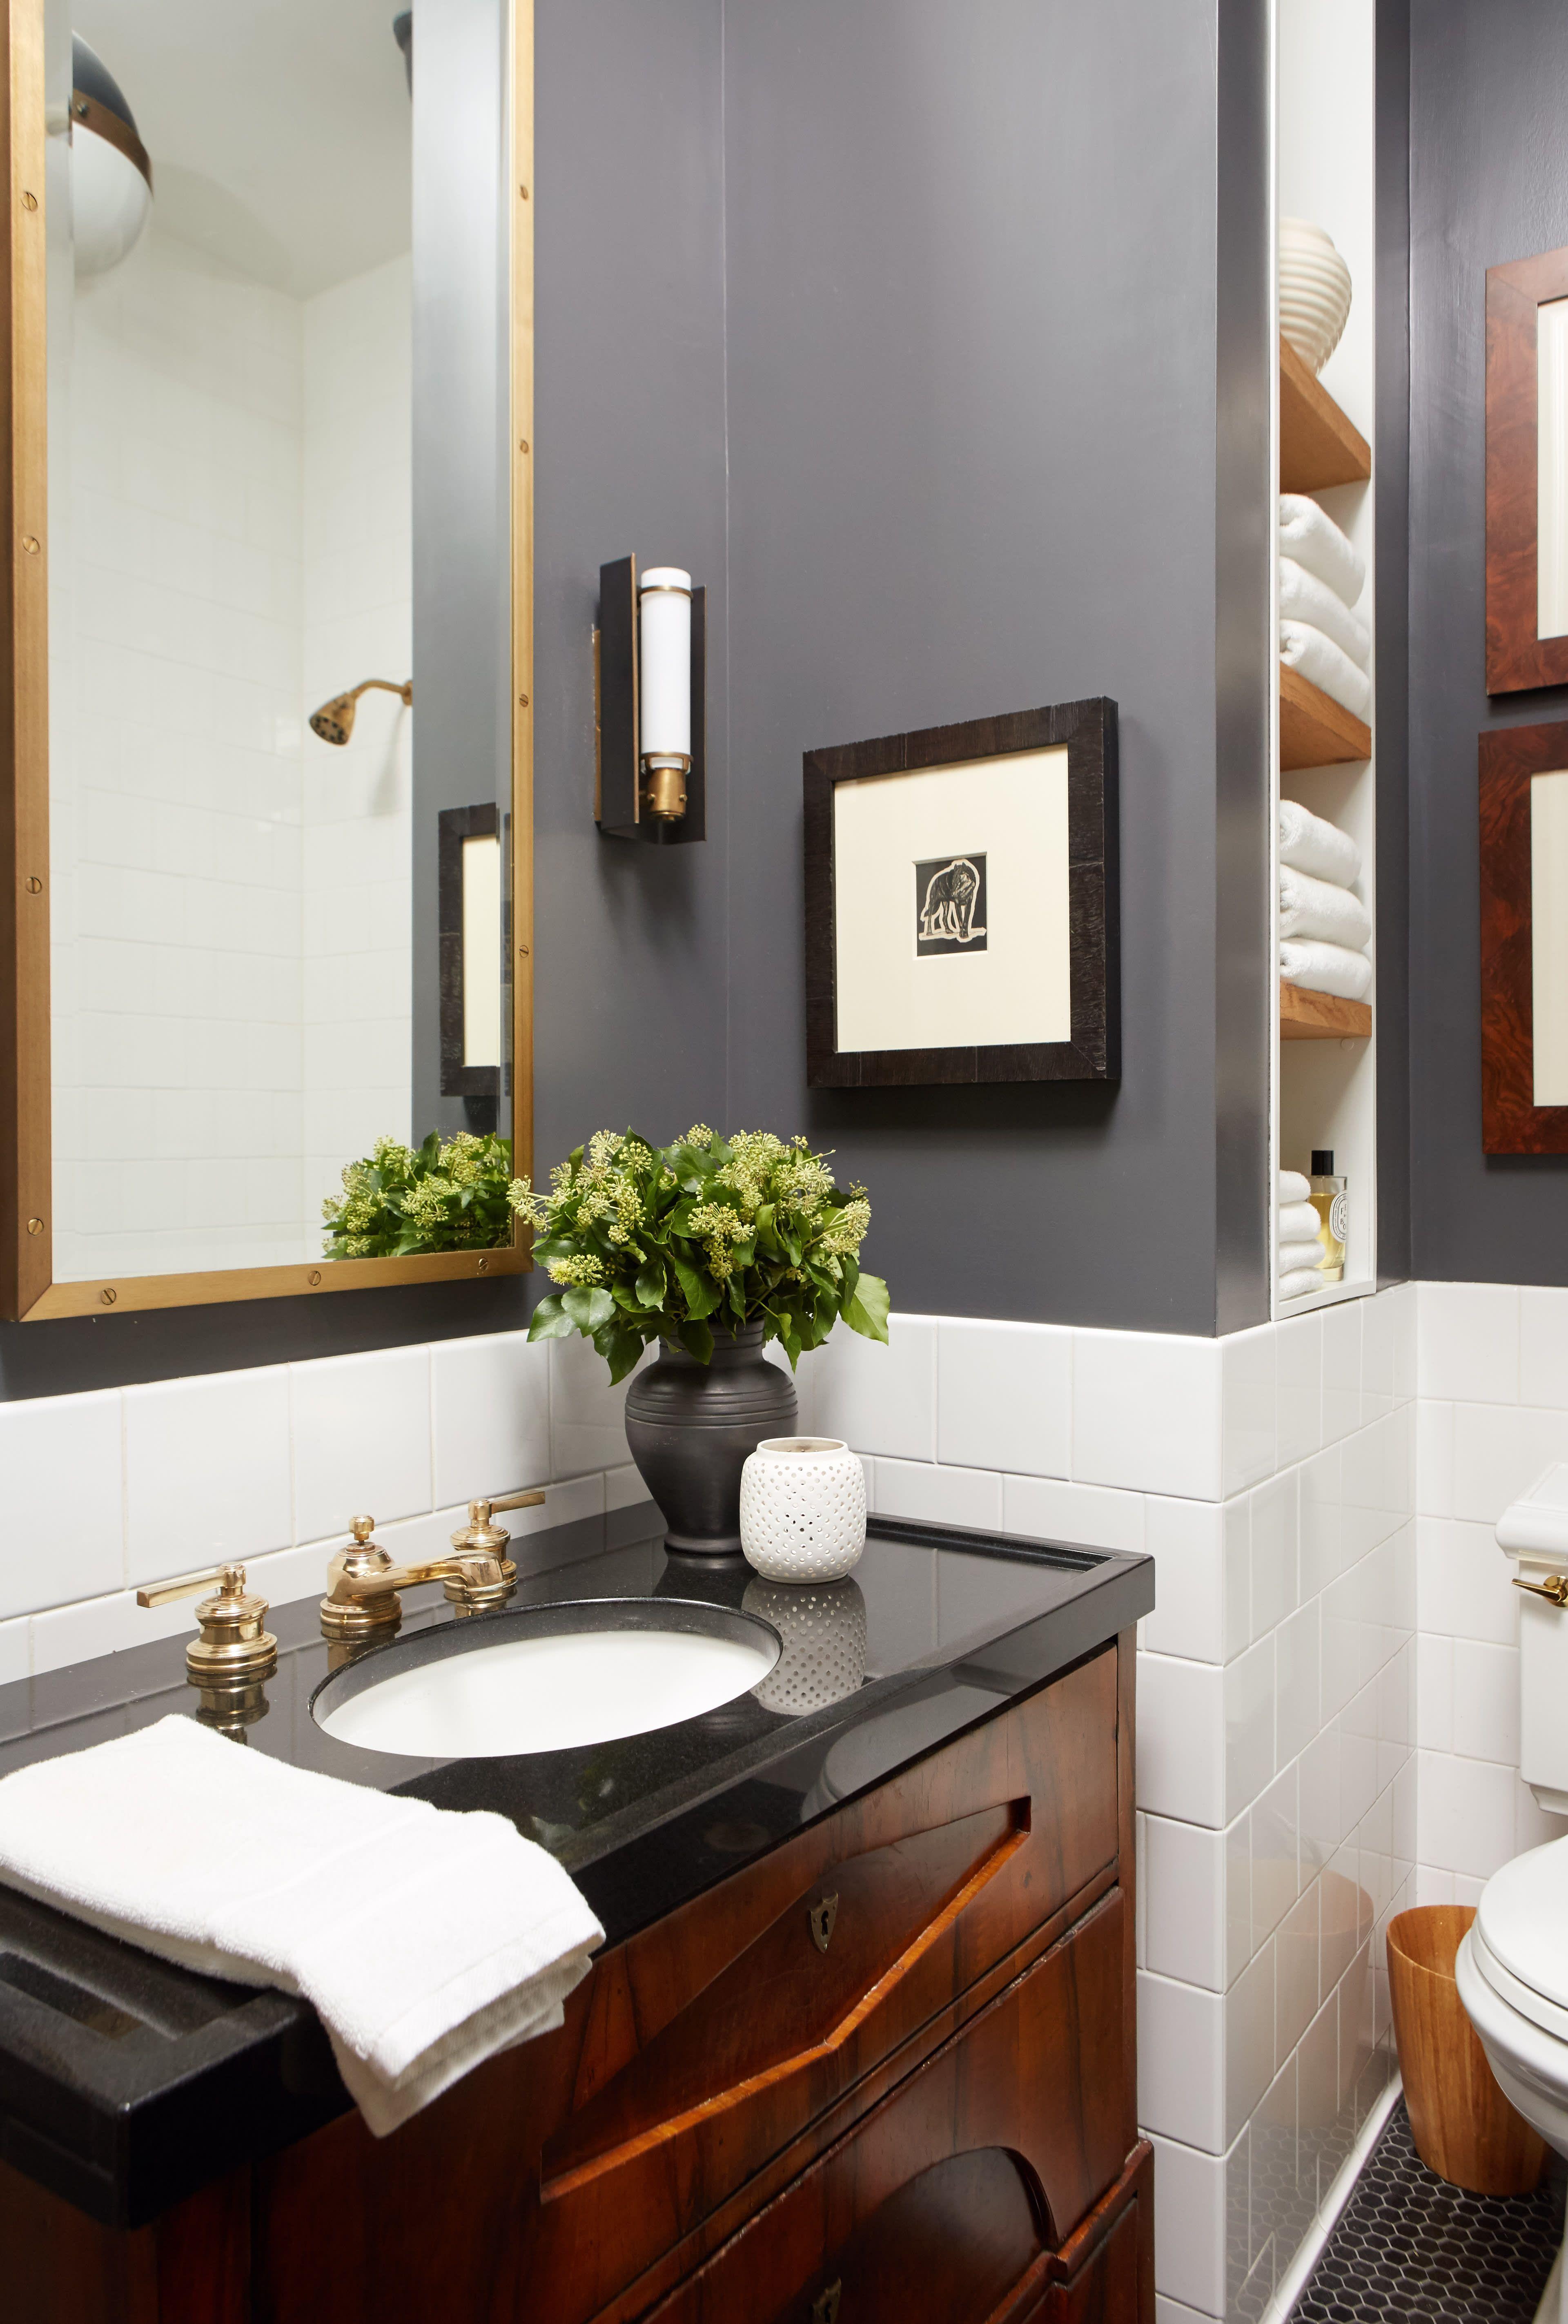 Step Inside Interior Designer Dan Mazzarini S Apartment In New York City Interior Home Decor Decor Interior Design